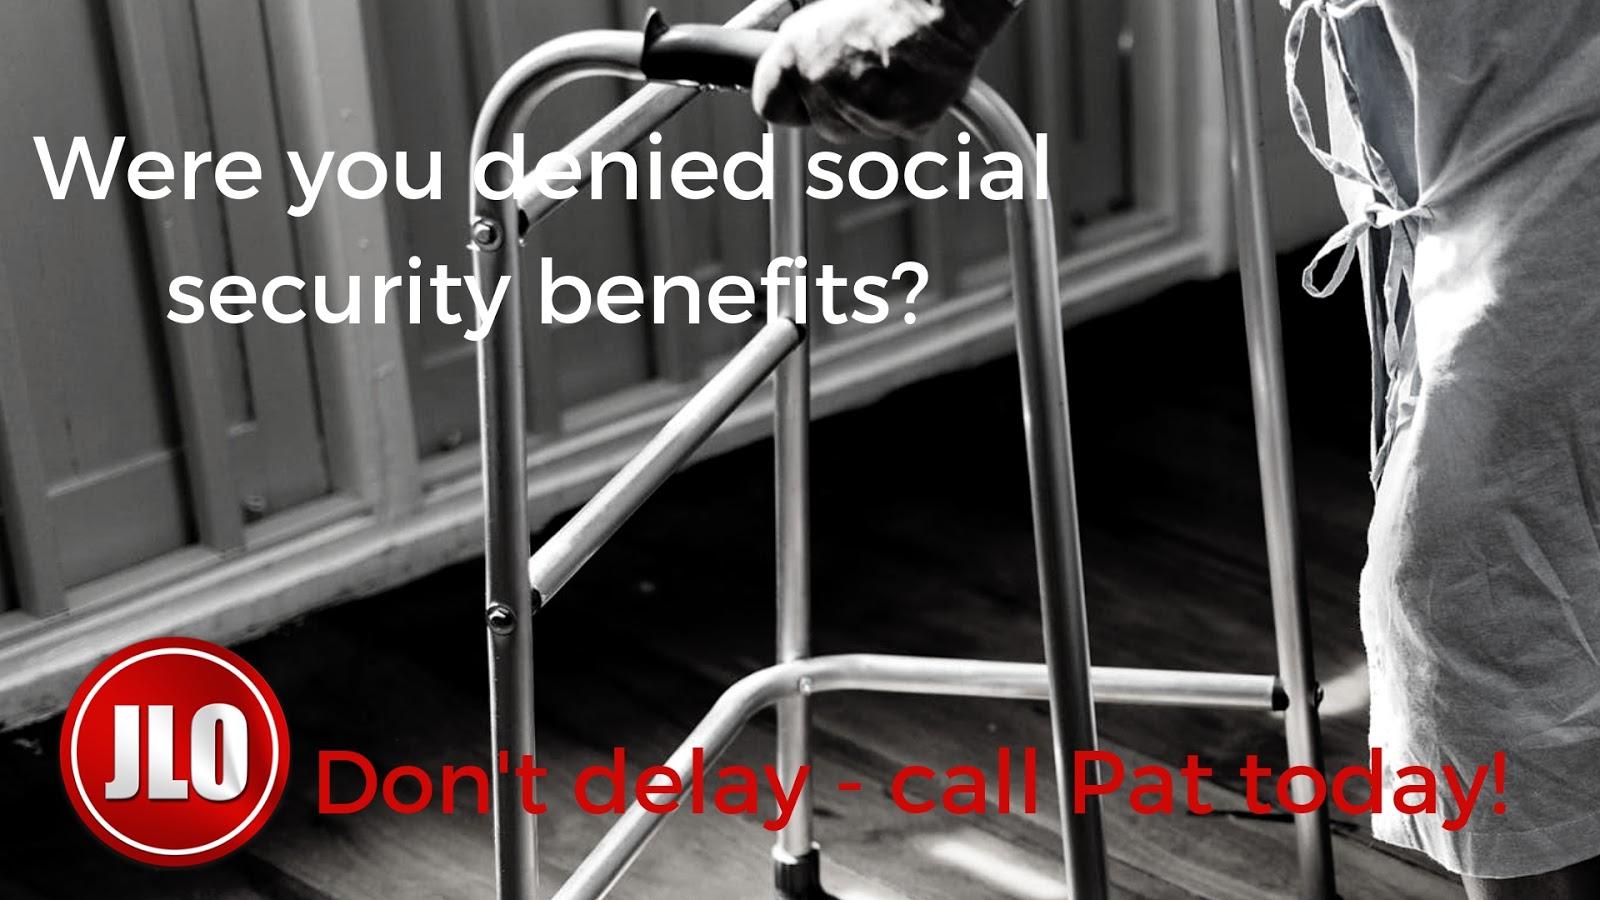 Wereyoudeniedsocialsecuritybenefits